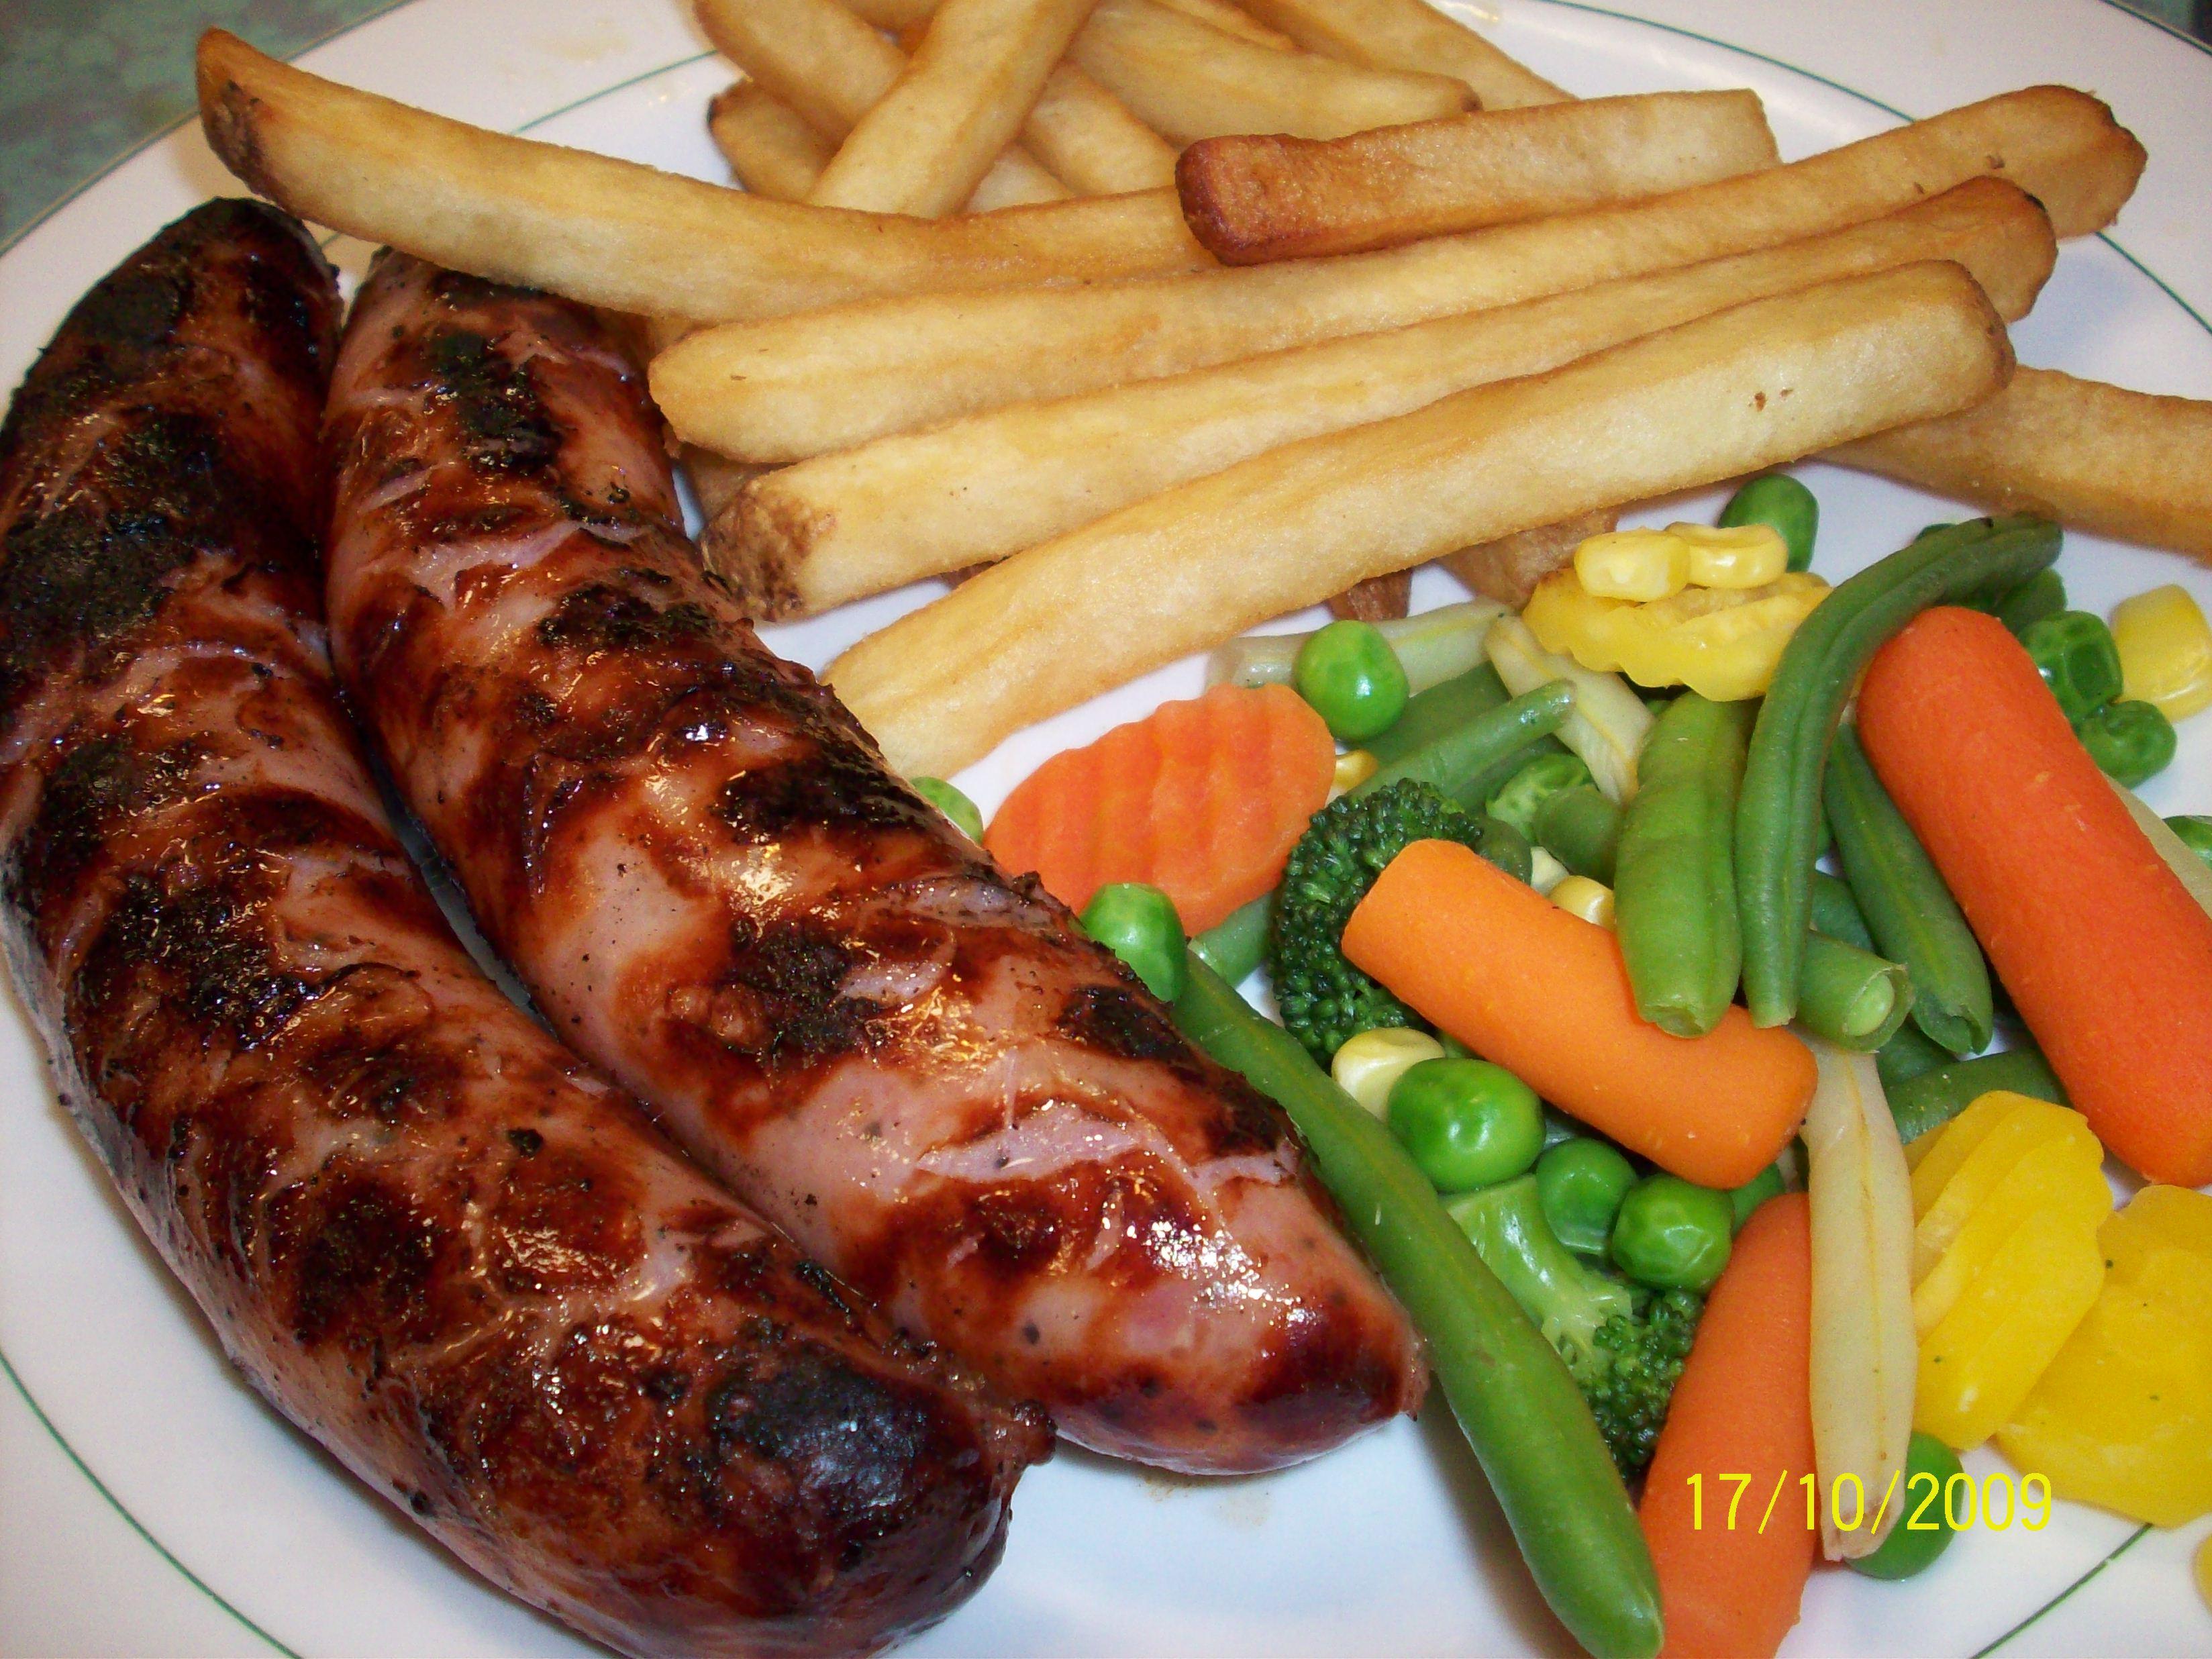 https://foodloader.net/cutie_2009-10-17_Burned_Sausages__Mized_Veggies_and_Fries.jpg